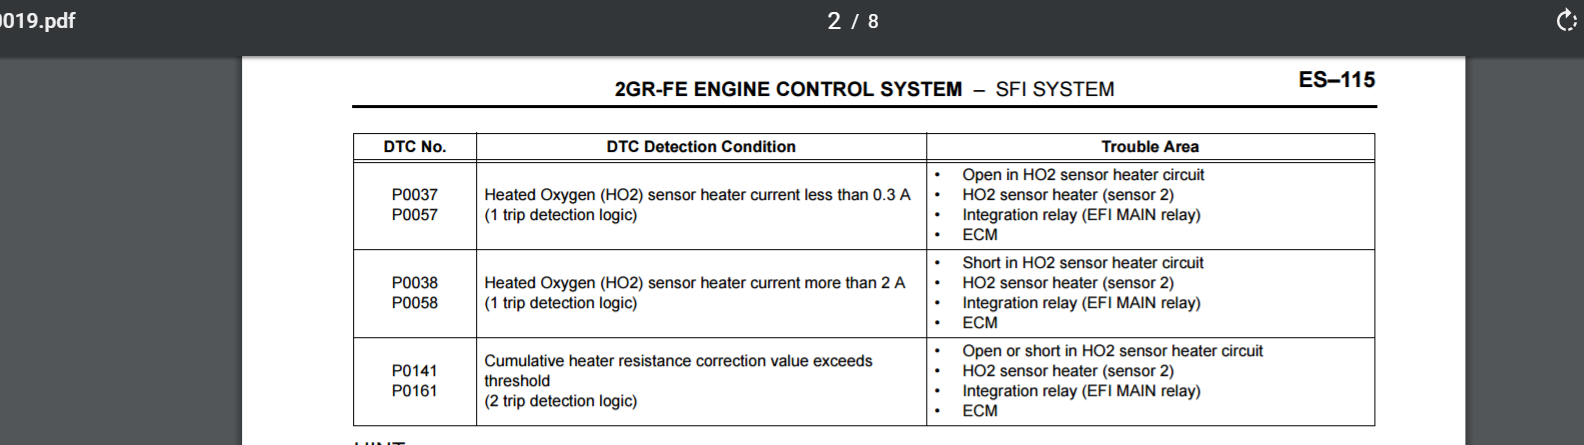 O2 heater circuit resistance P0057, p0161 - 9PA, 9PA1 (Cayenne